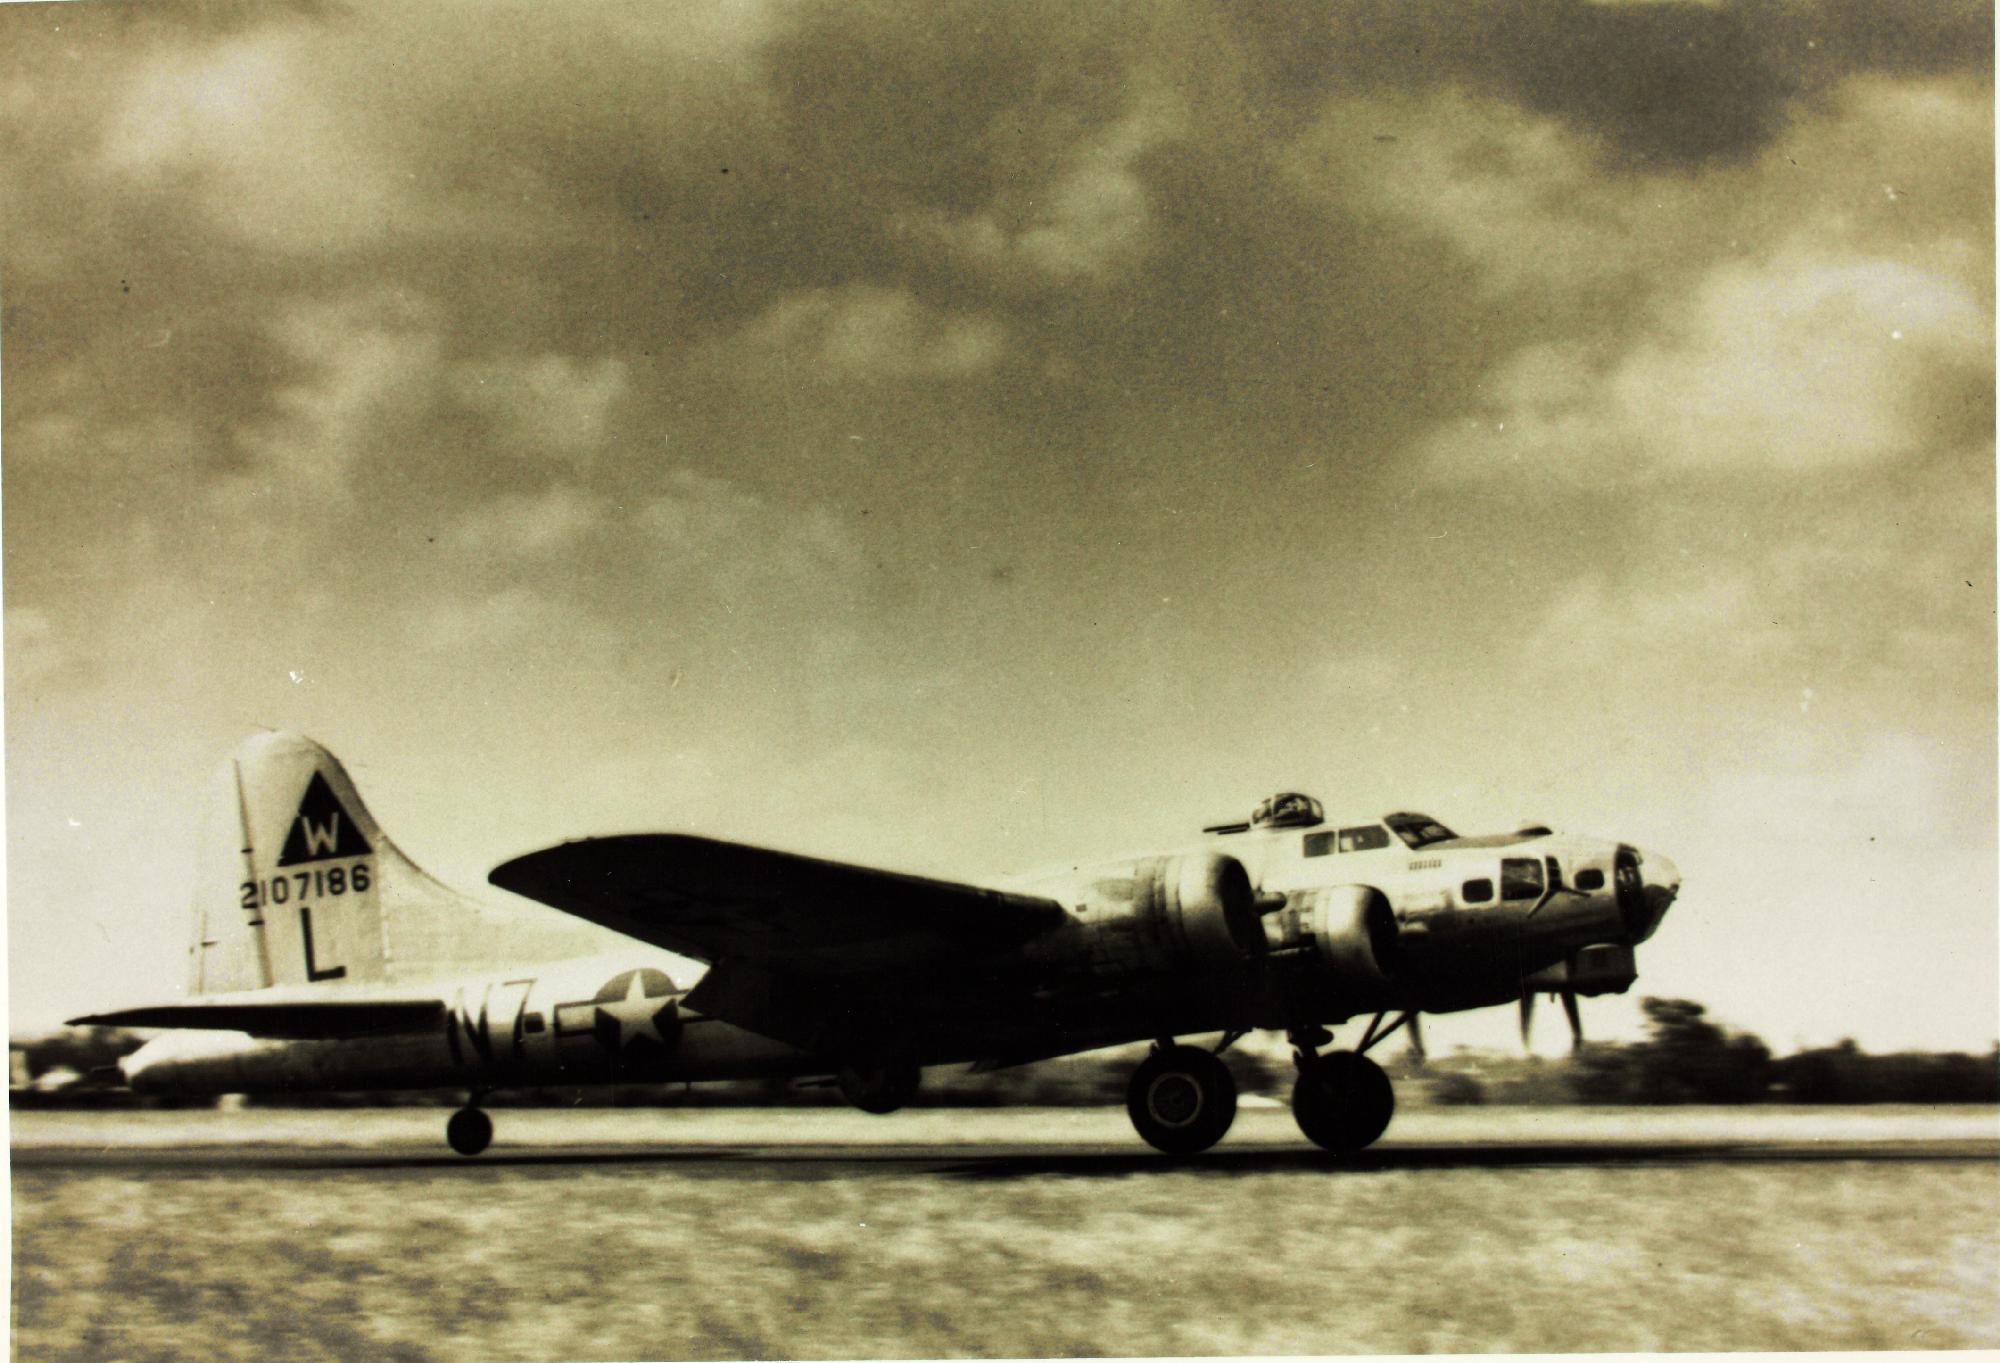 B-17 #42-107186